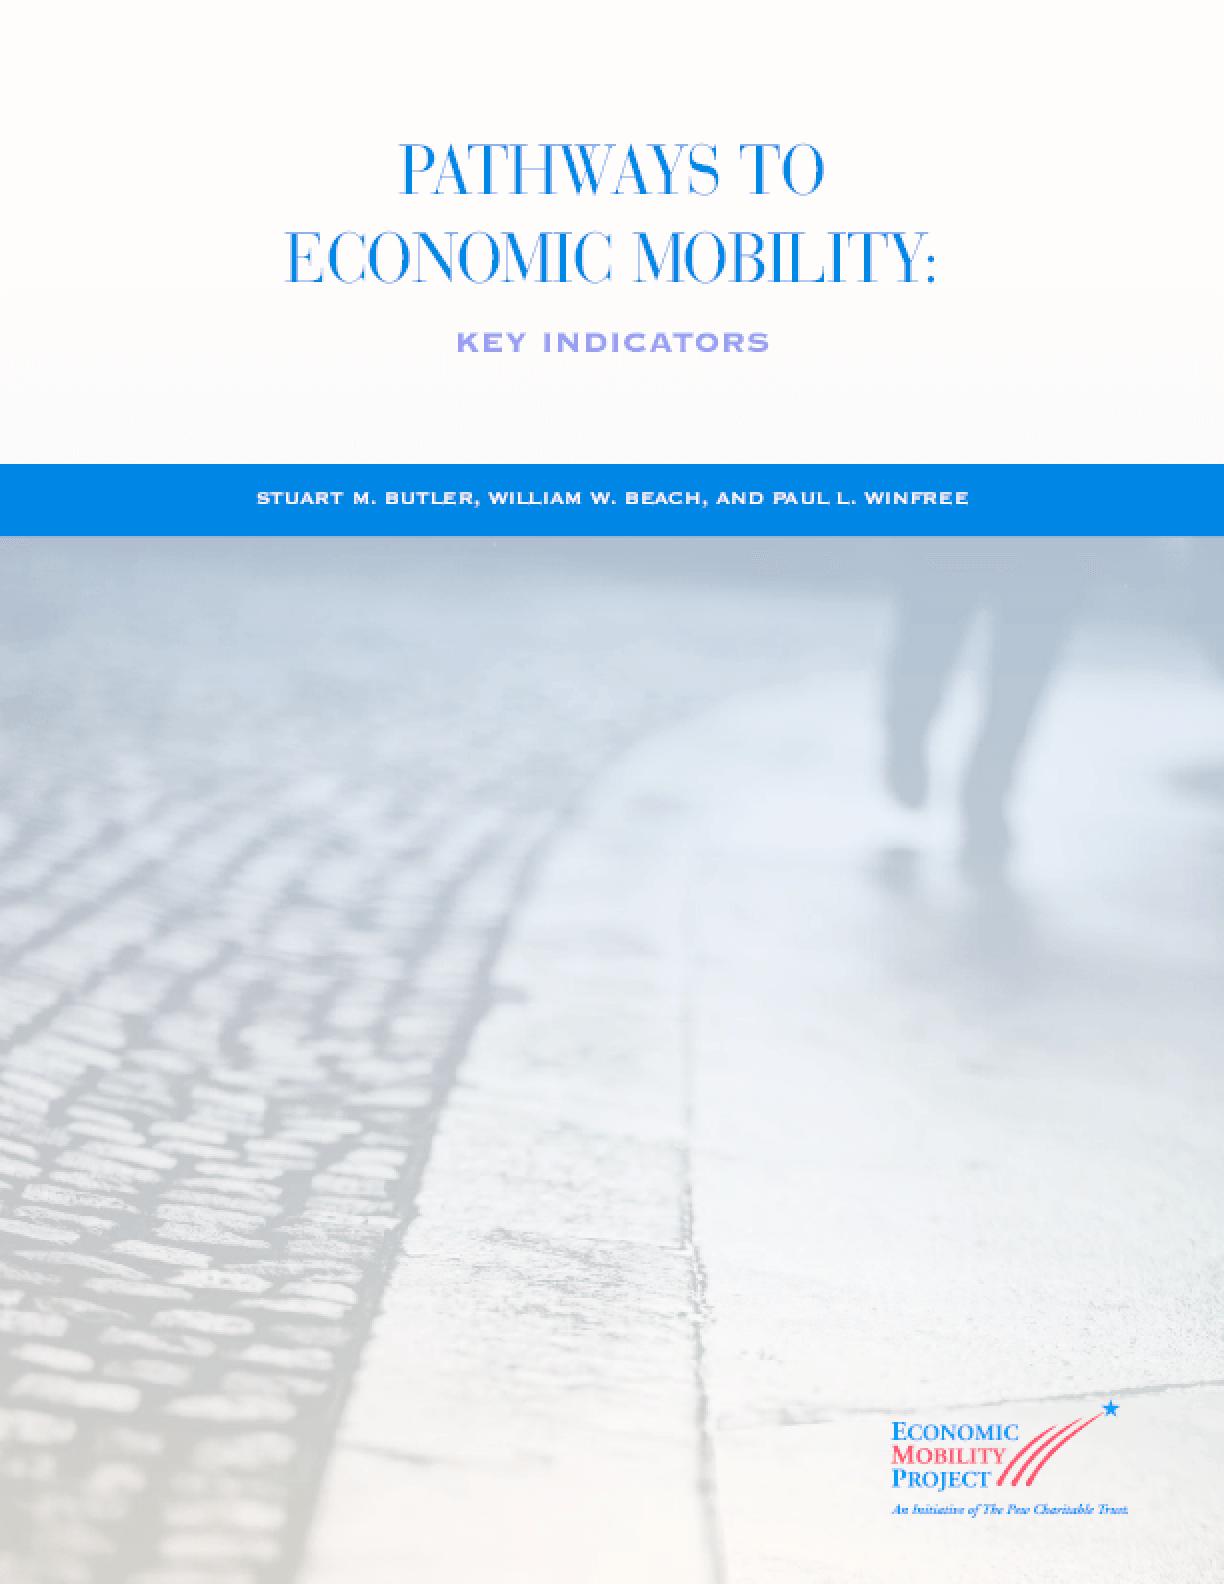 Pathways to Economic Mobility: Key Indicators